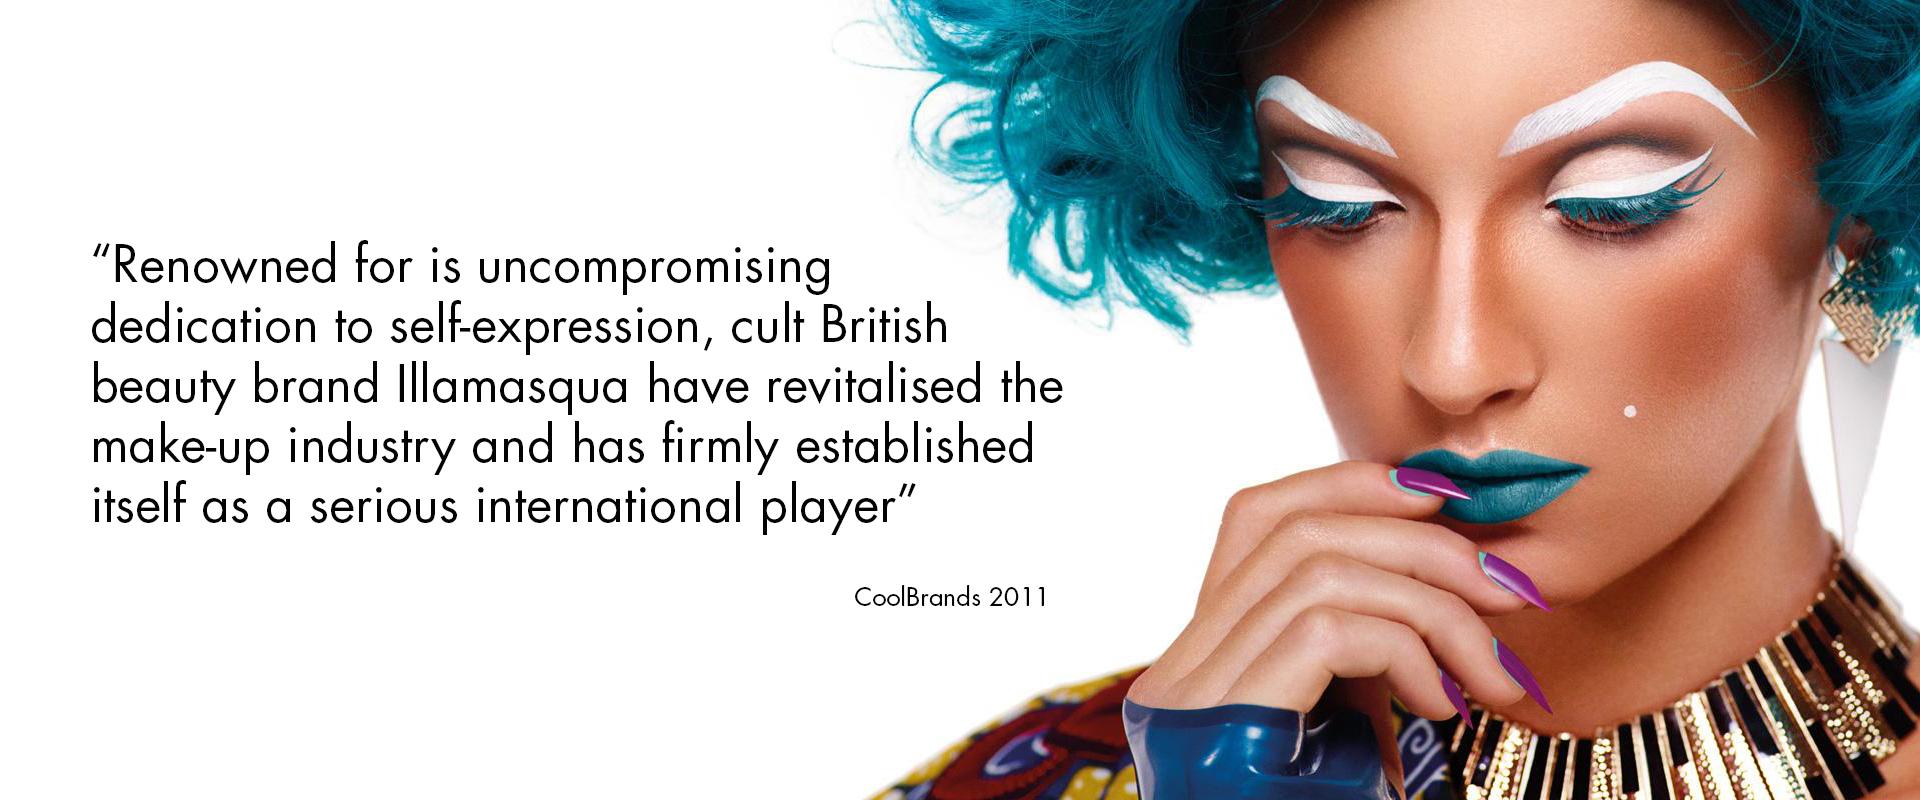 Illamasqua - curventa - makeup - range - brand - beauty - photography - coolbrands - cult brand